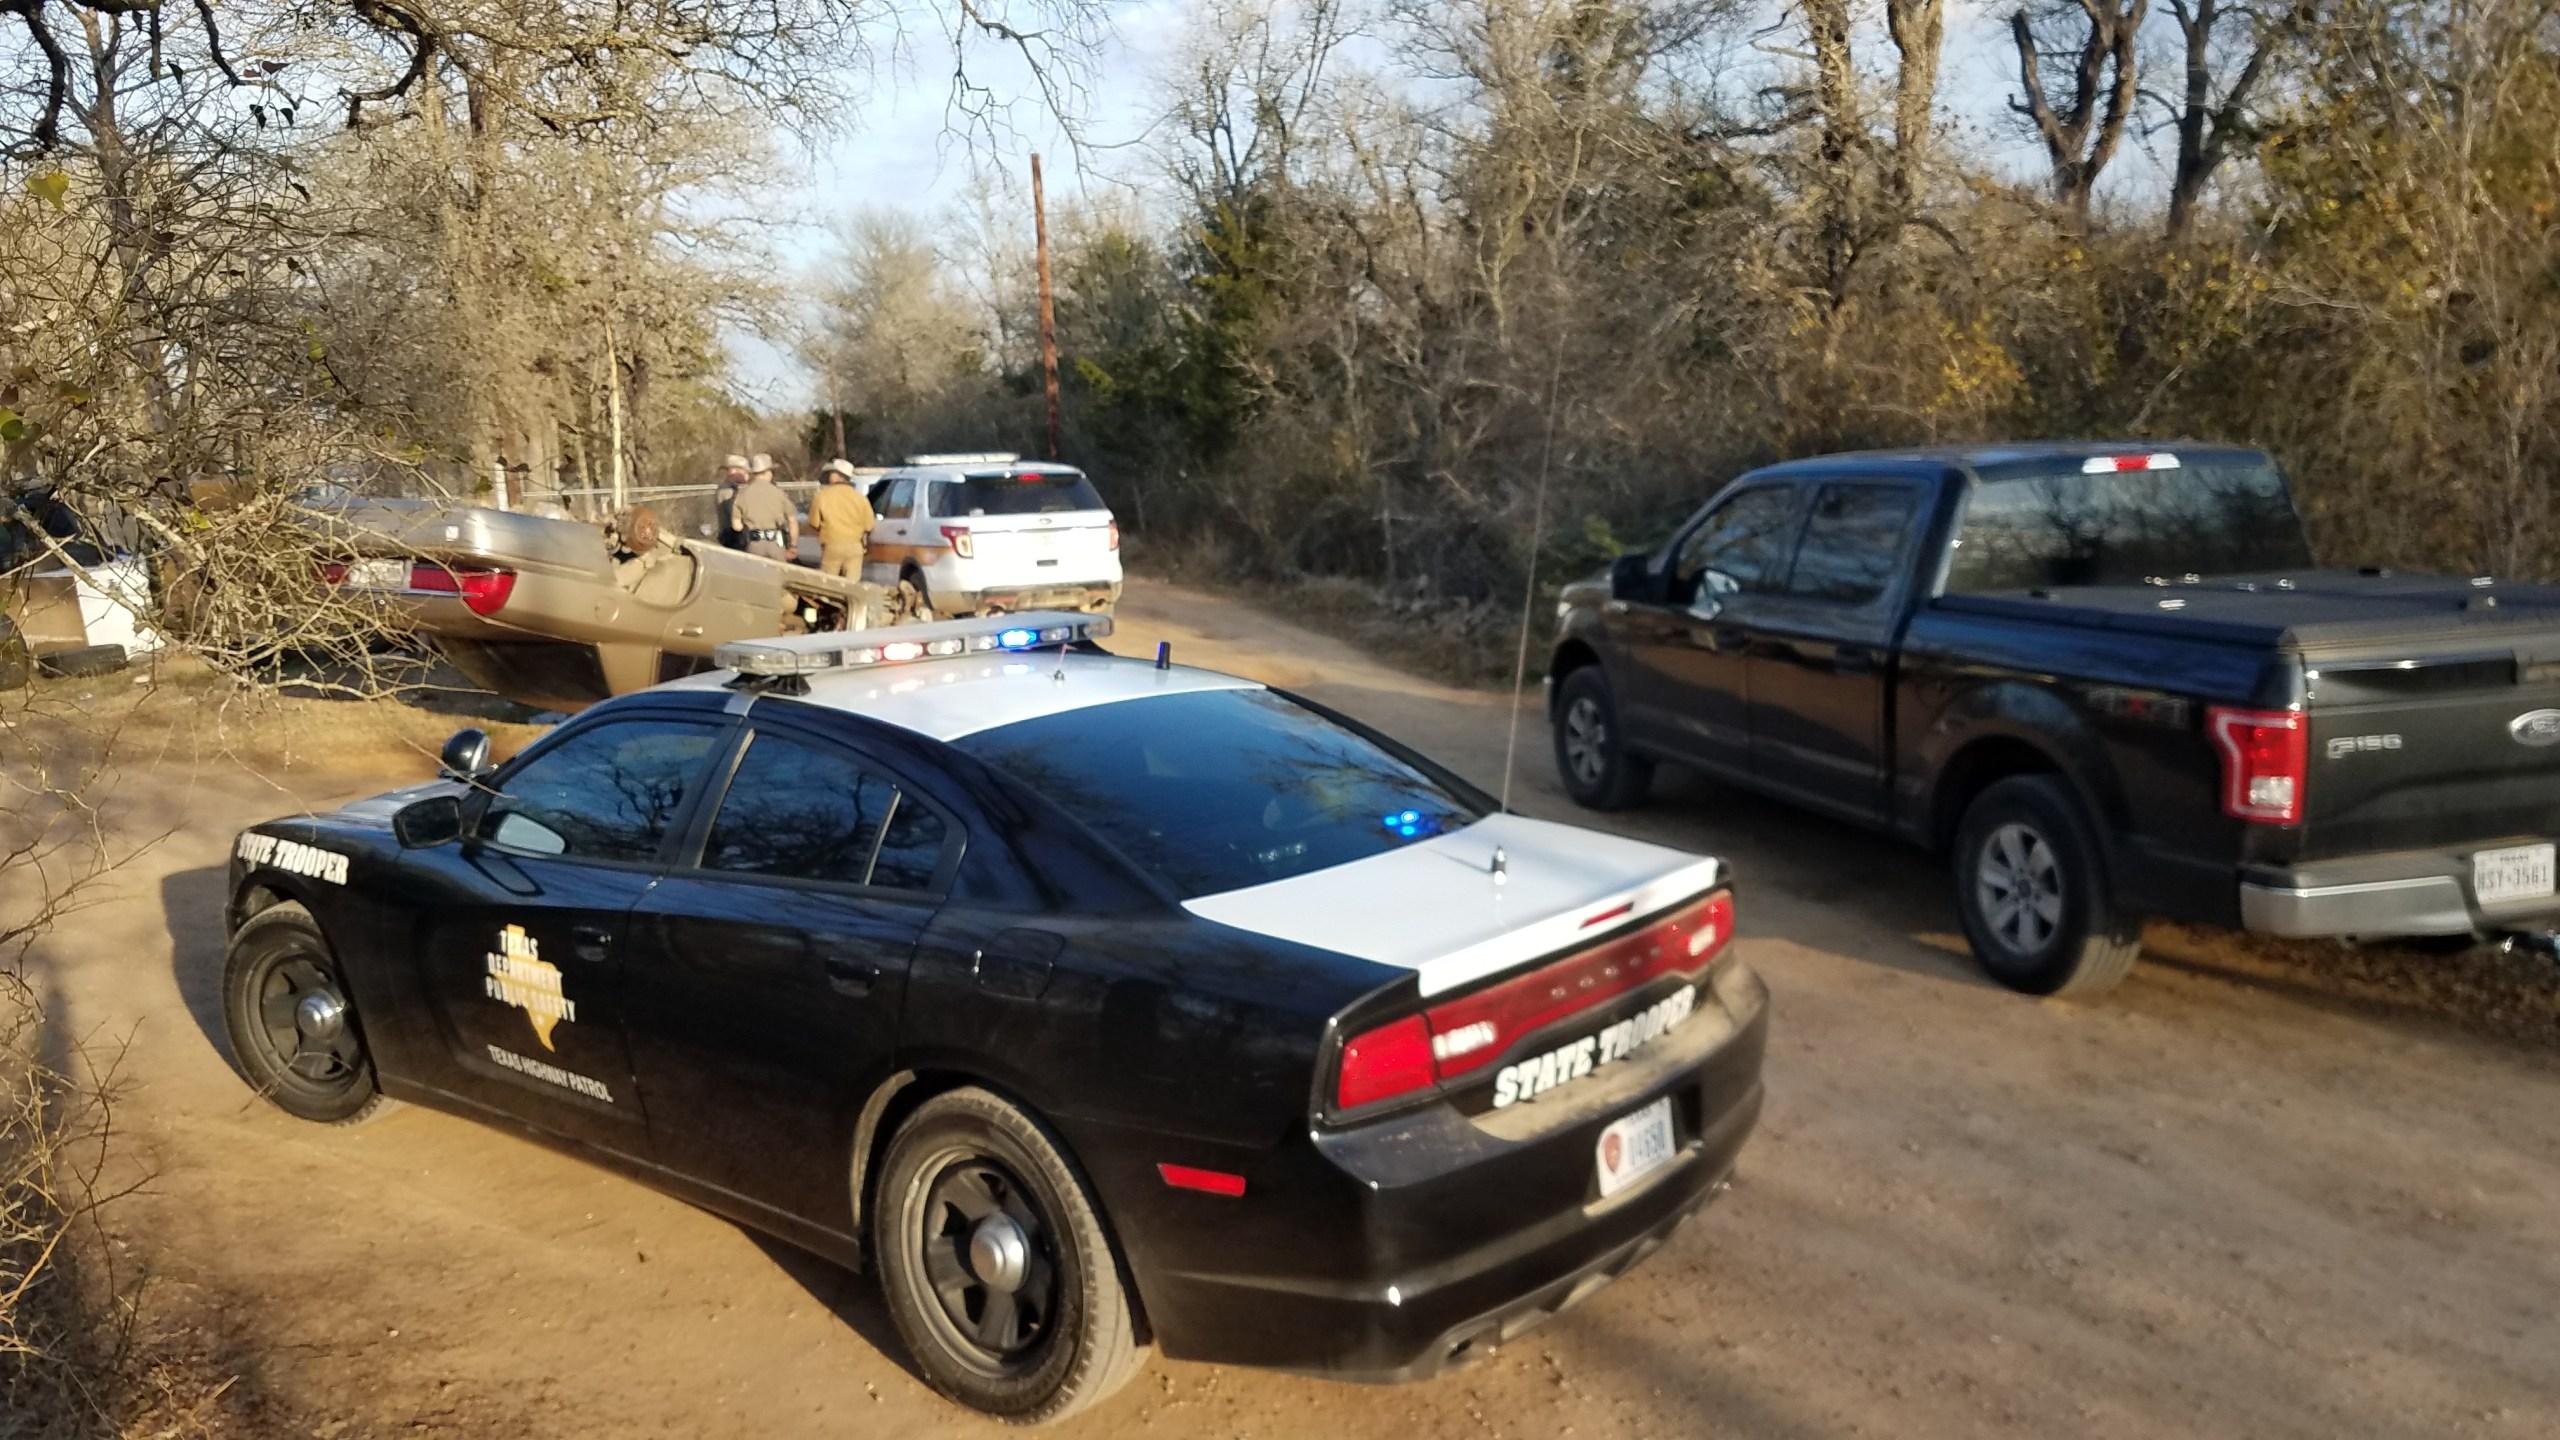 caldwell deputy shot_627600